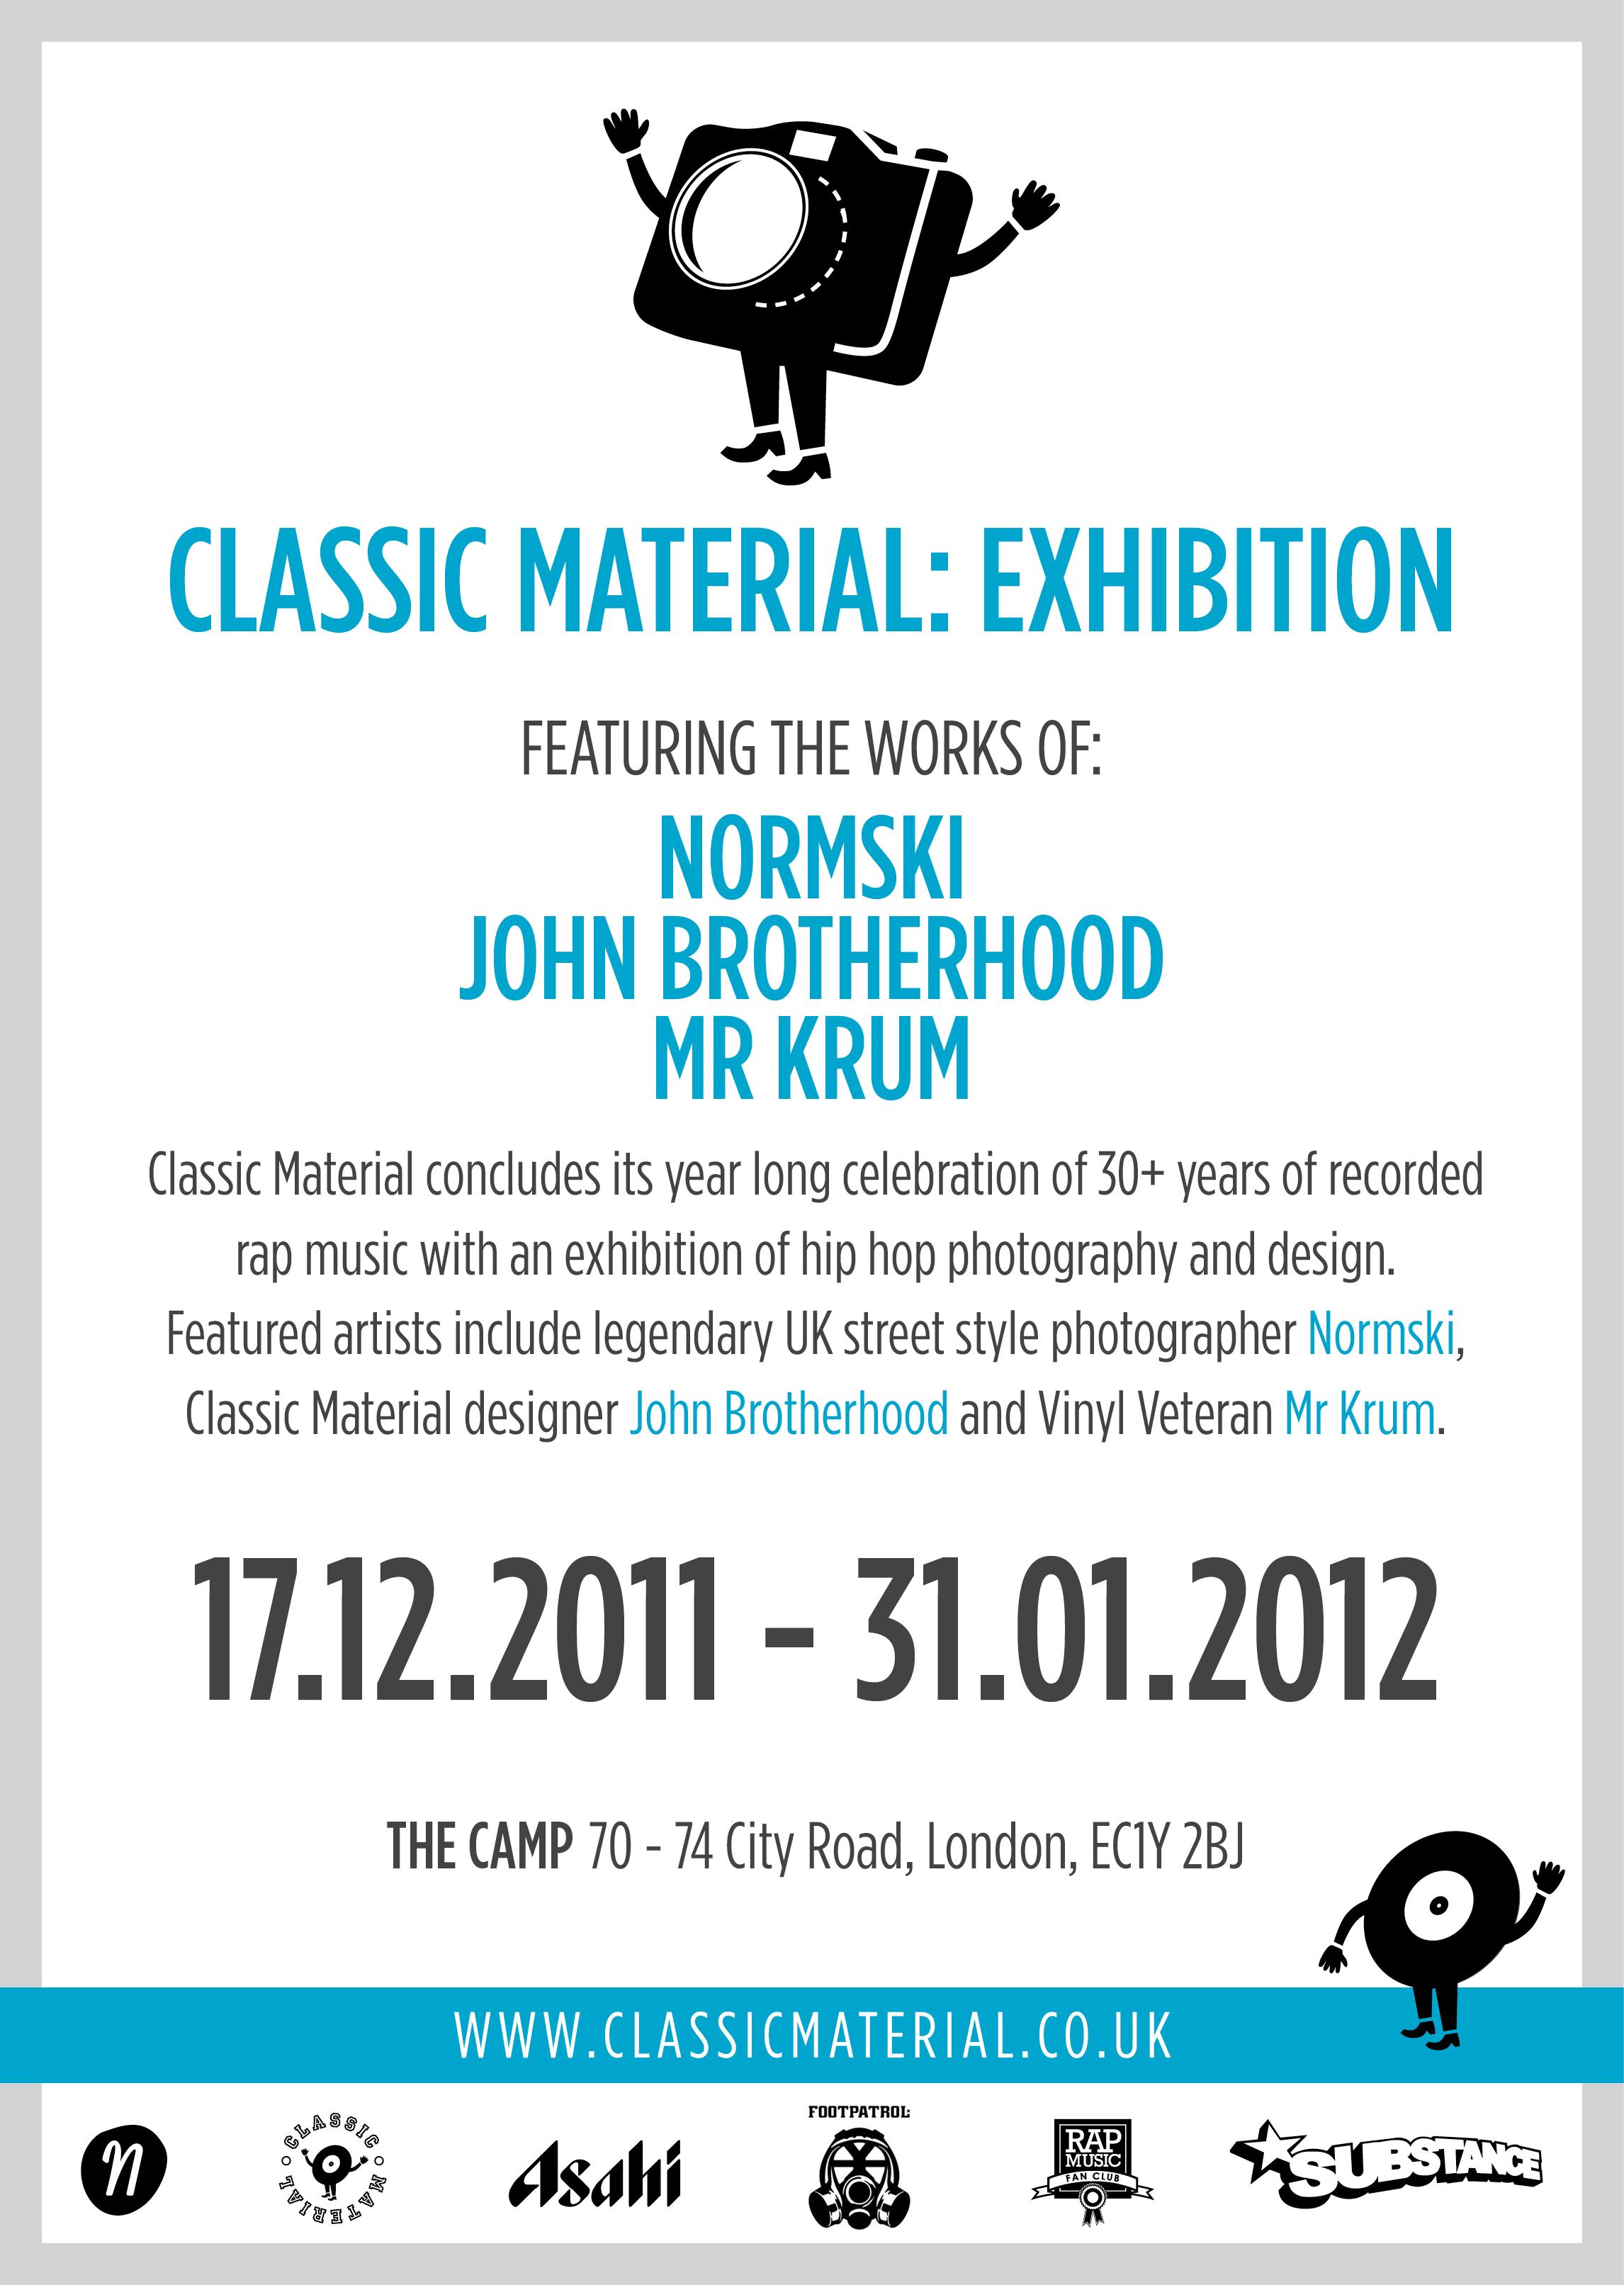 Classic Material Exhibition